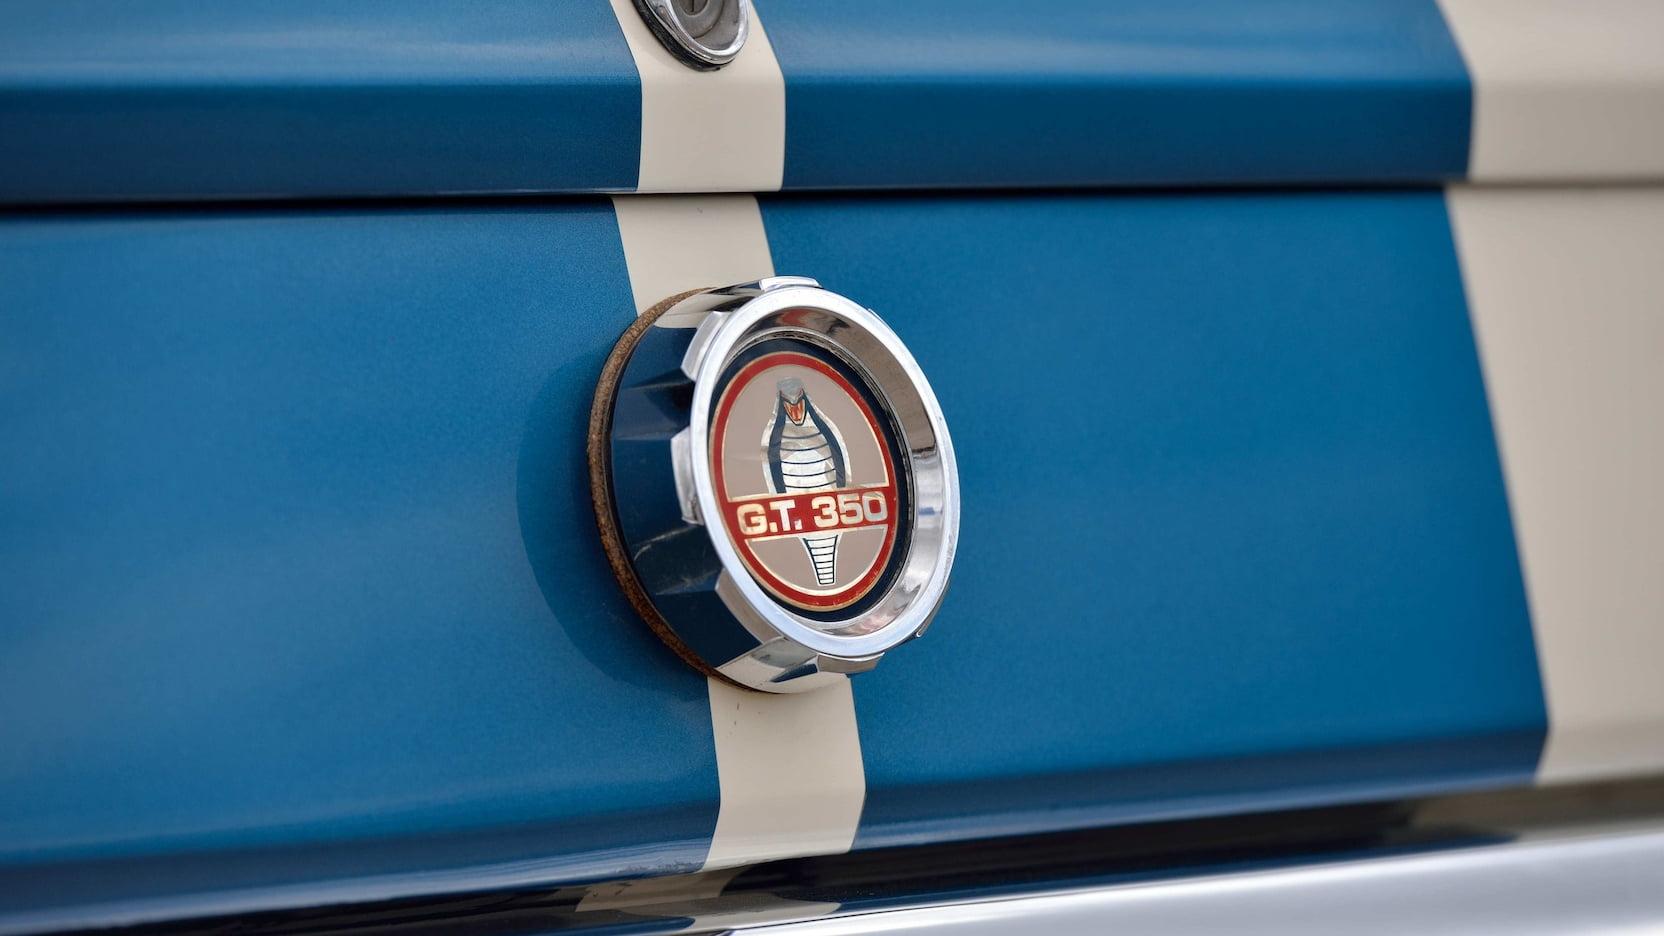 1966 Shelby GT350 gas cap